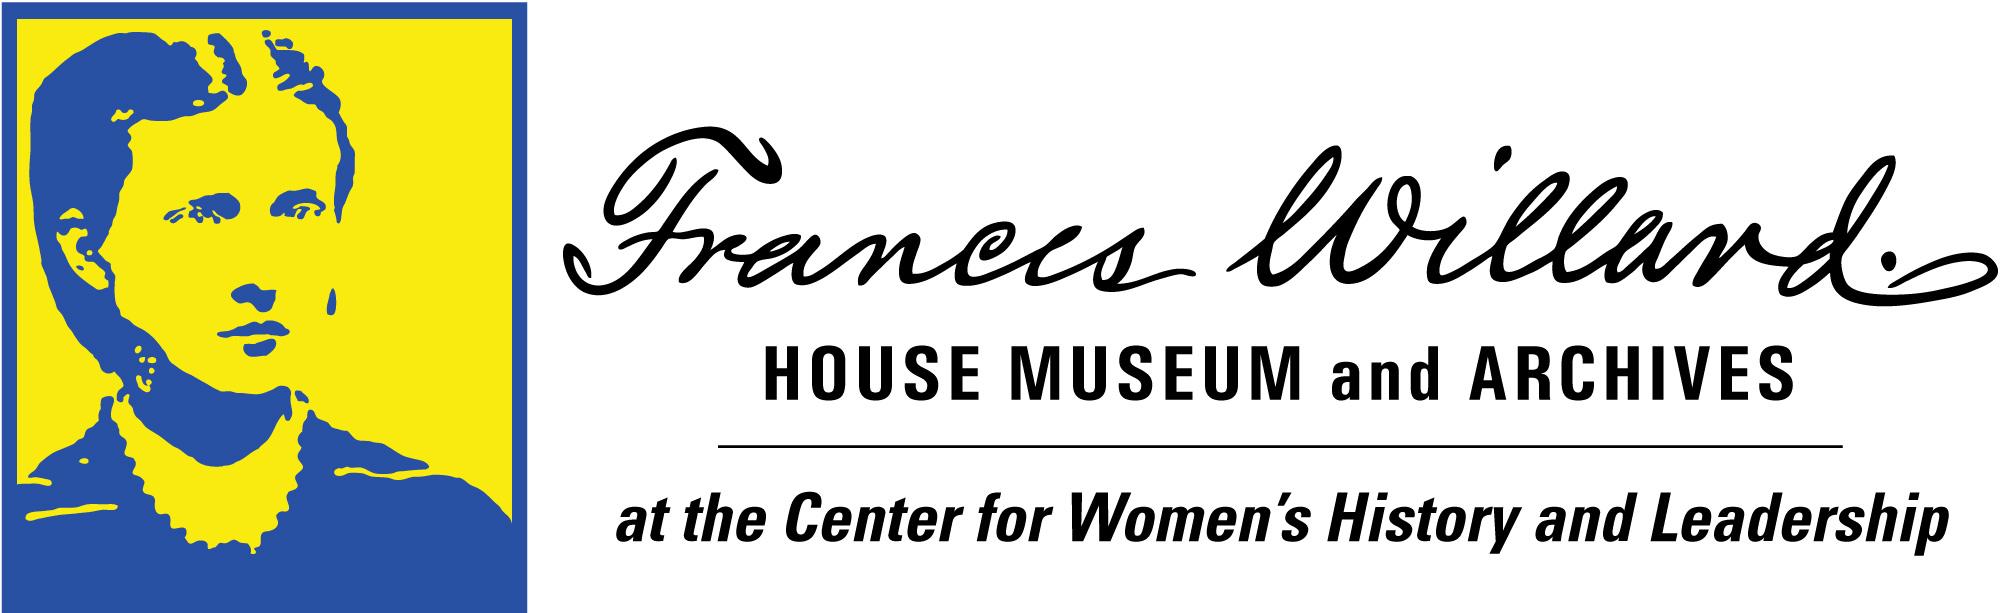 Frances Willard House Museum & Archives